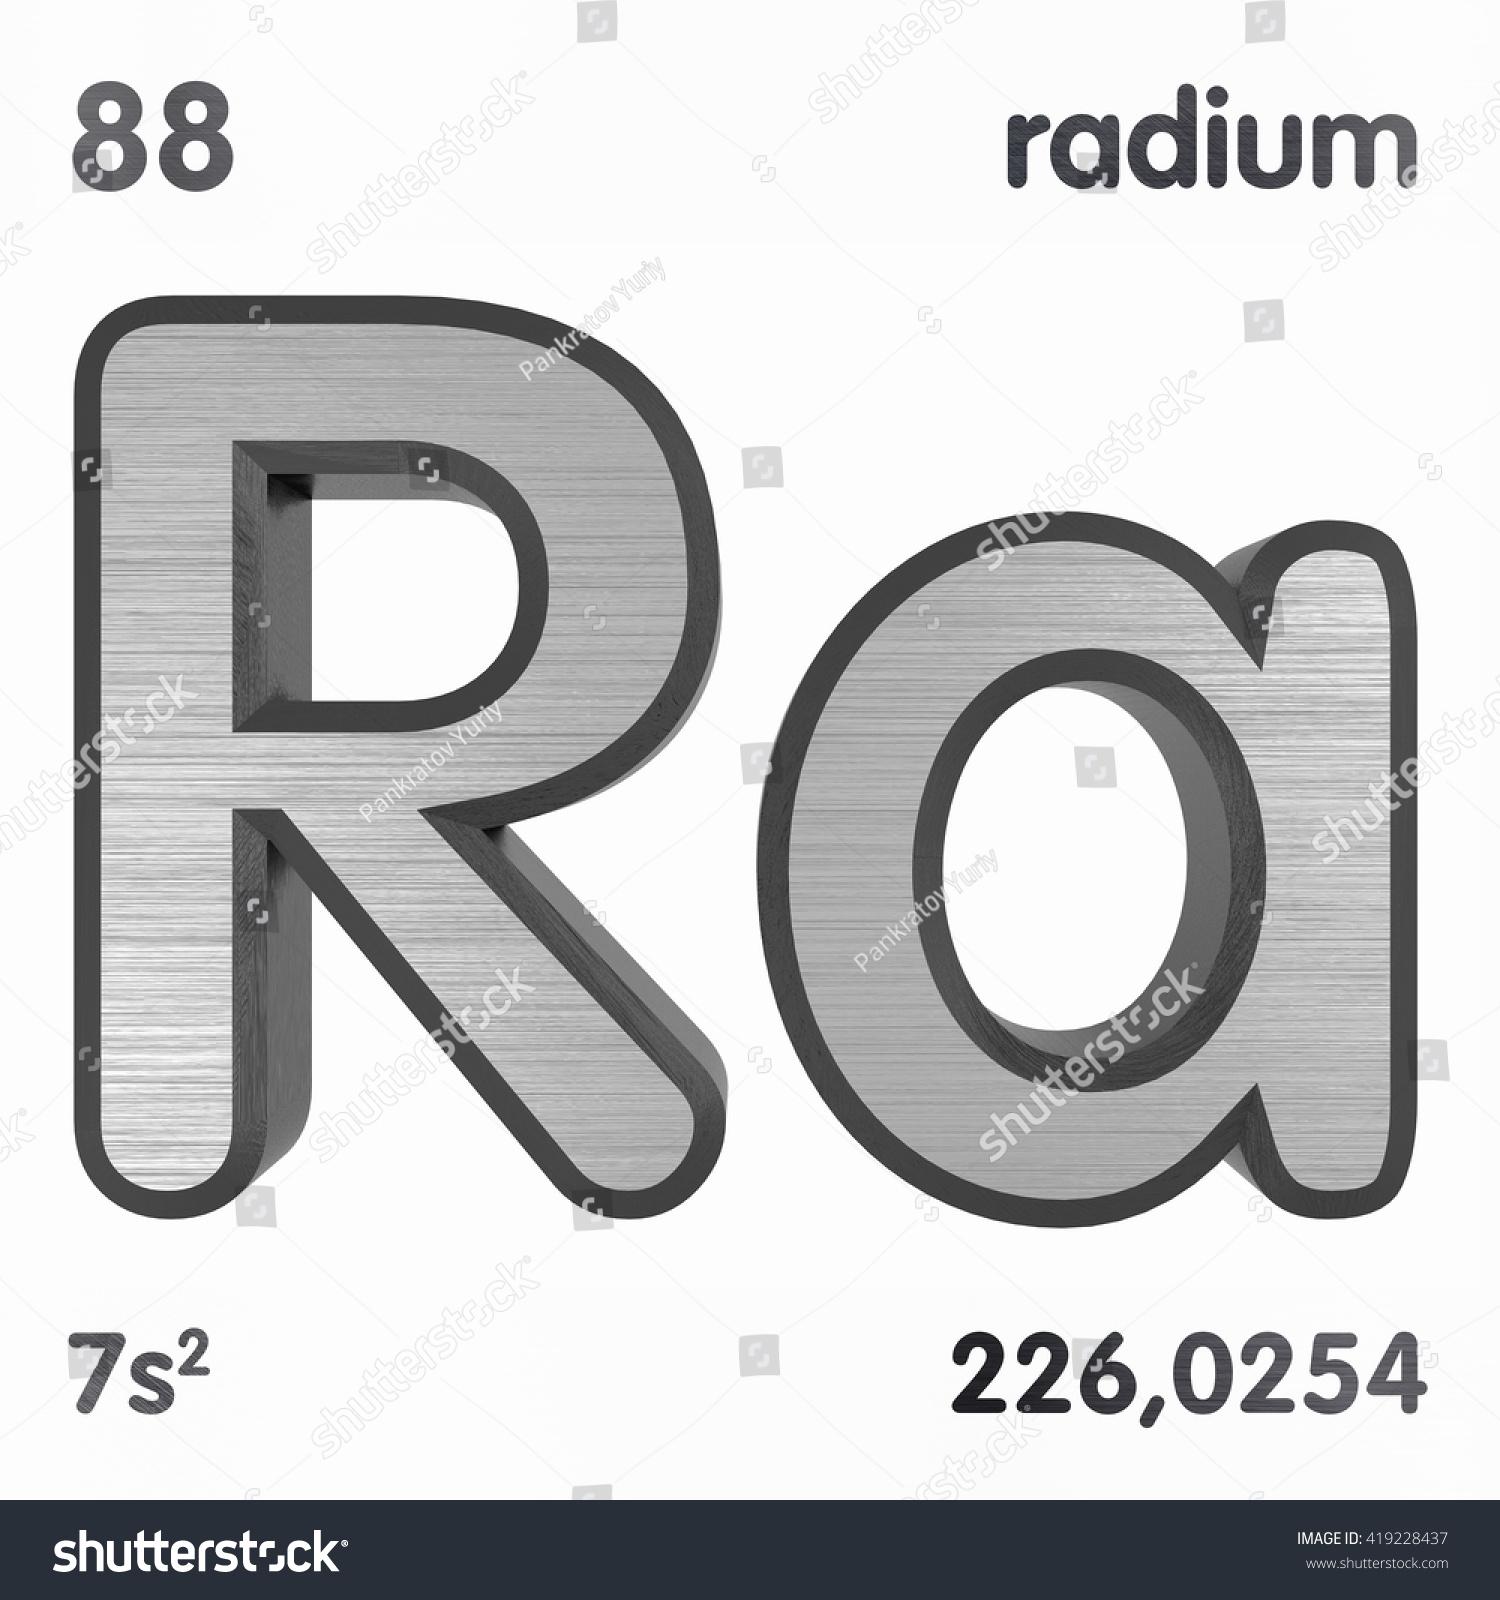 Radium periodic table choice image periodic table images periodic table elements radium 3d title stock illustration periodic table of elements radium 3d title isolated gamestrikefo Images